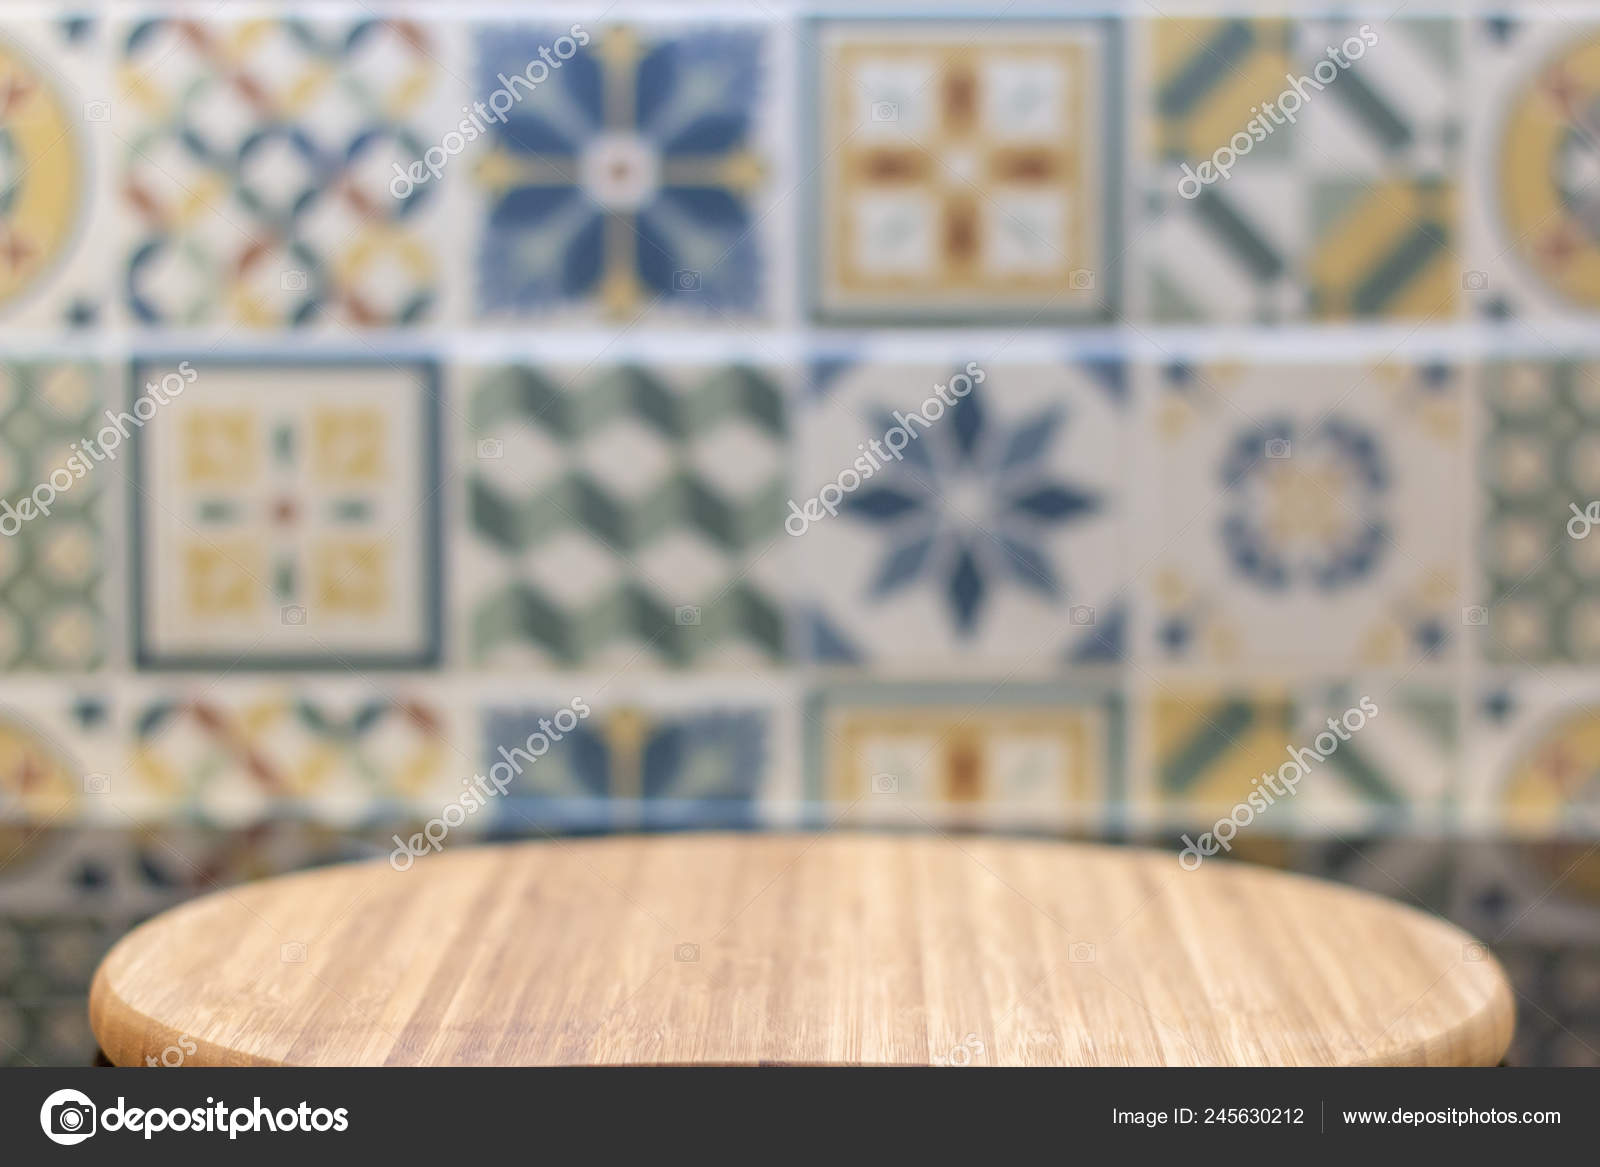 Empty Black Table Cutting Board Wall Multicolored Tiles Product Display Stock Photo C Shunddima Gmail Com 245630212